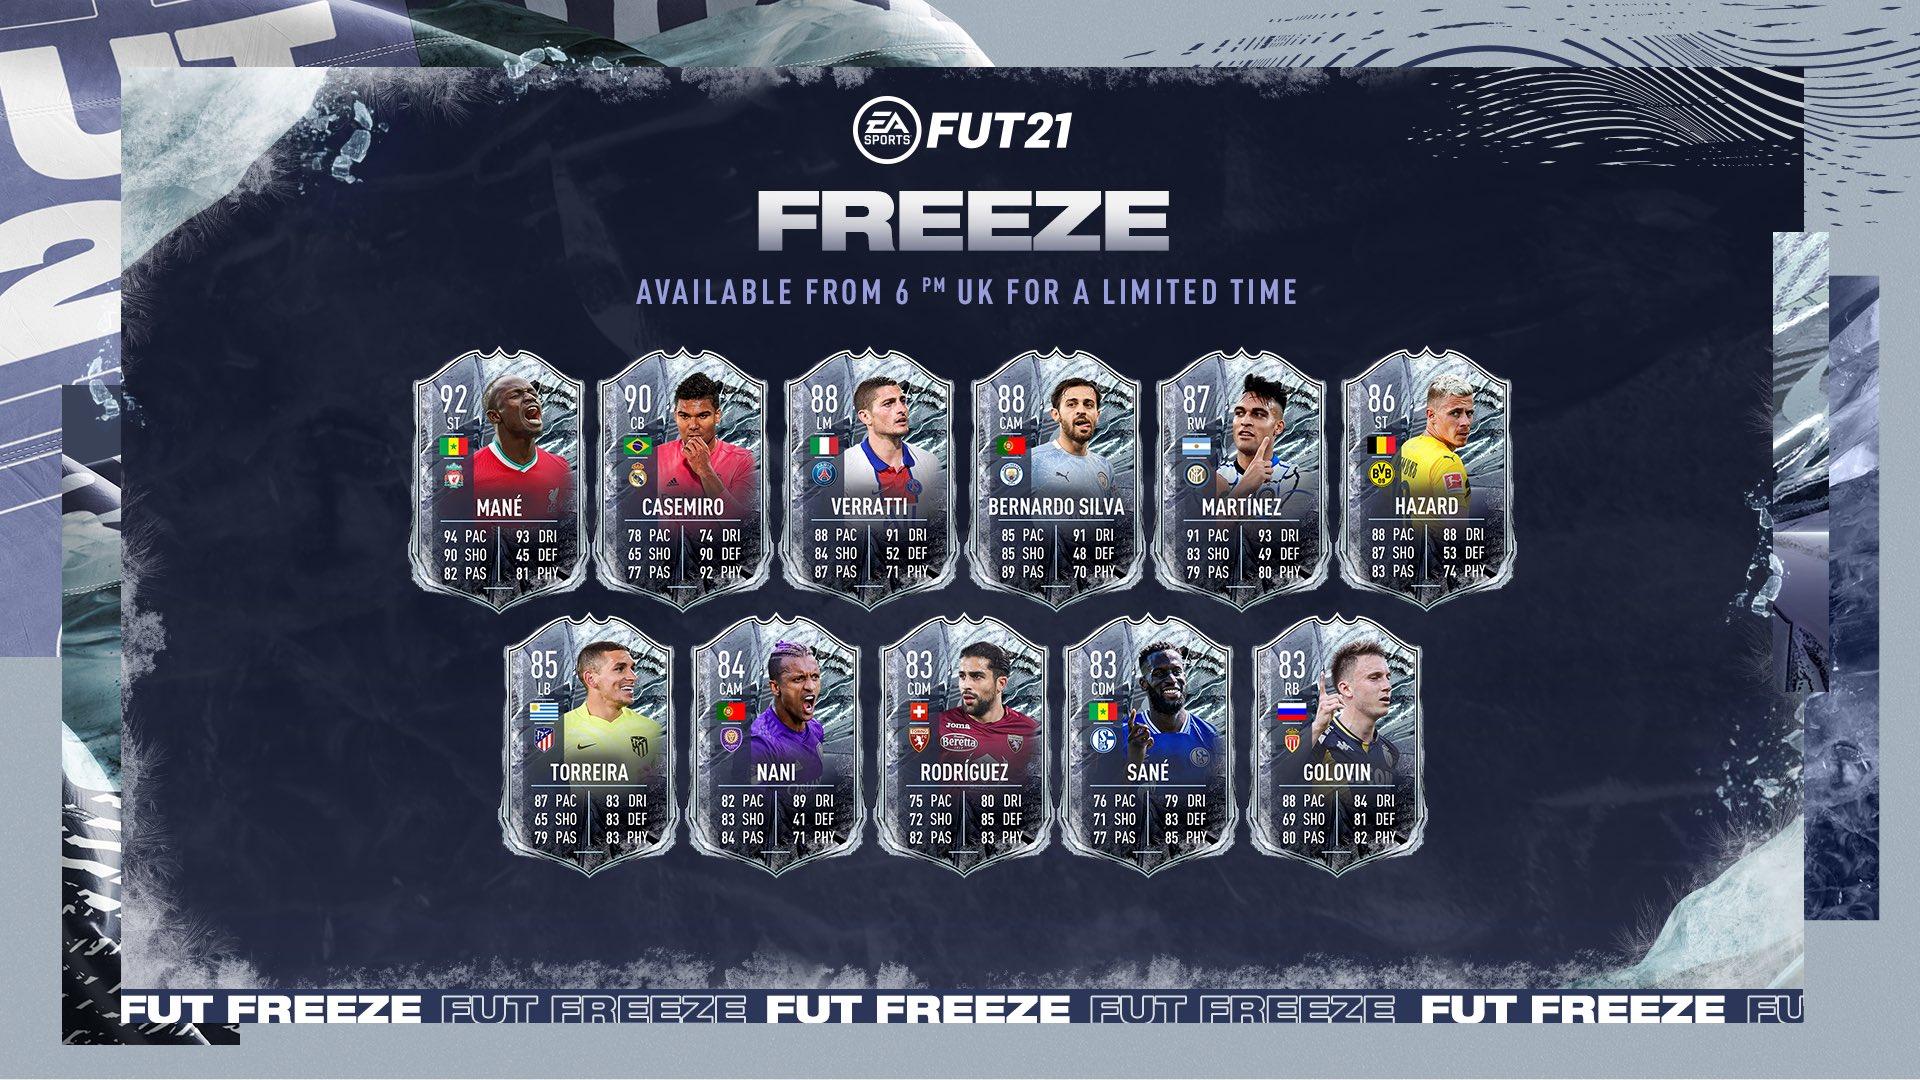 FUT Freeze